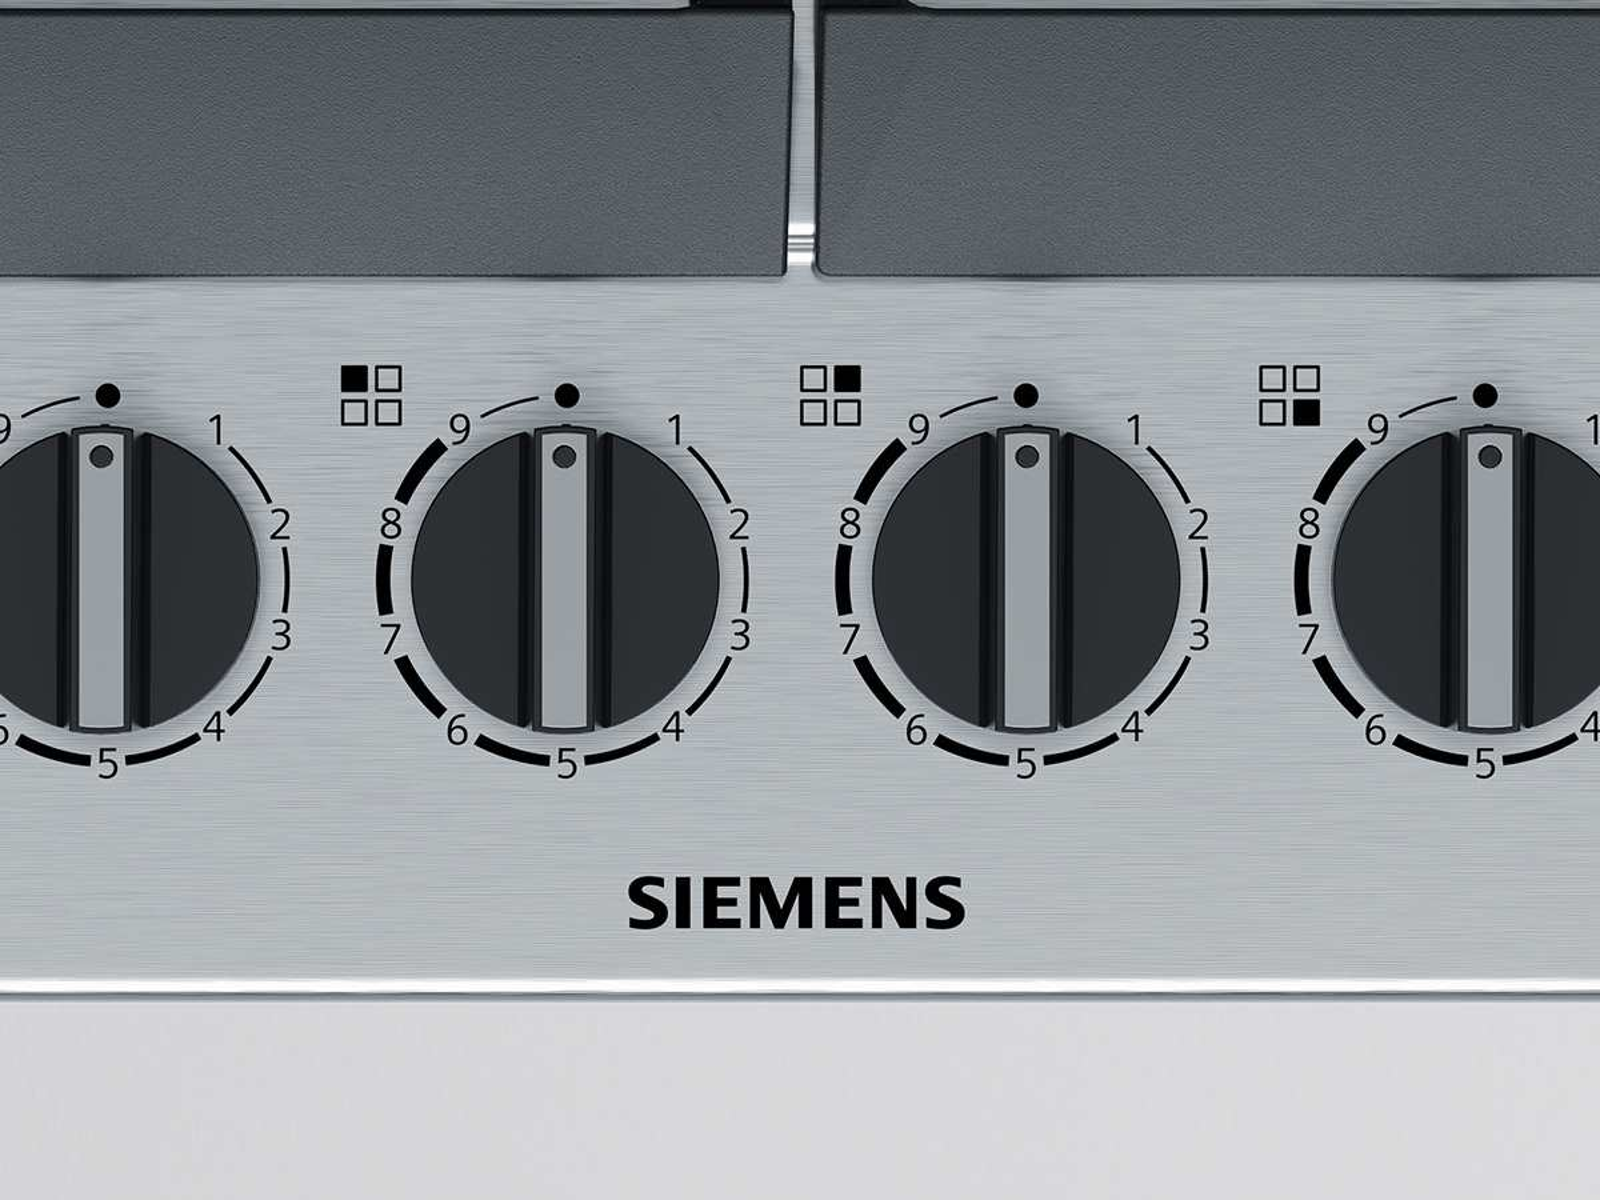 Siemens ec6a5hb90d gaskochfeld edelstahl autark for Siemens gaskochfeld